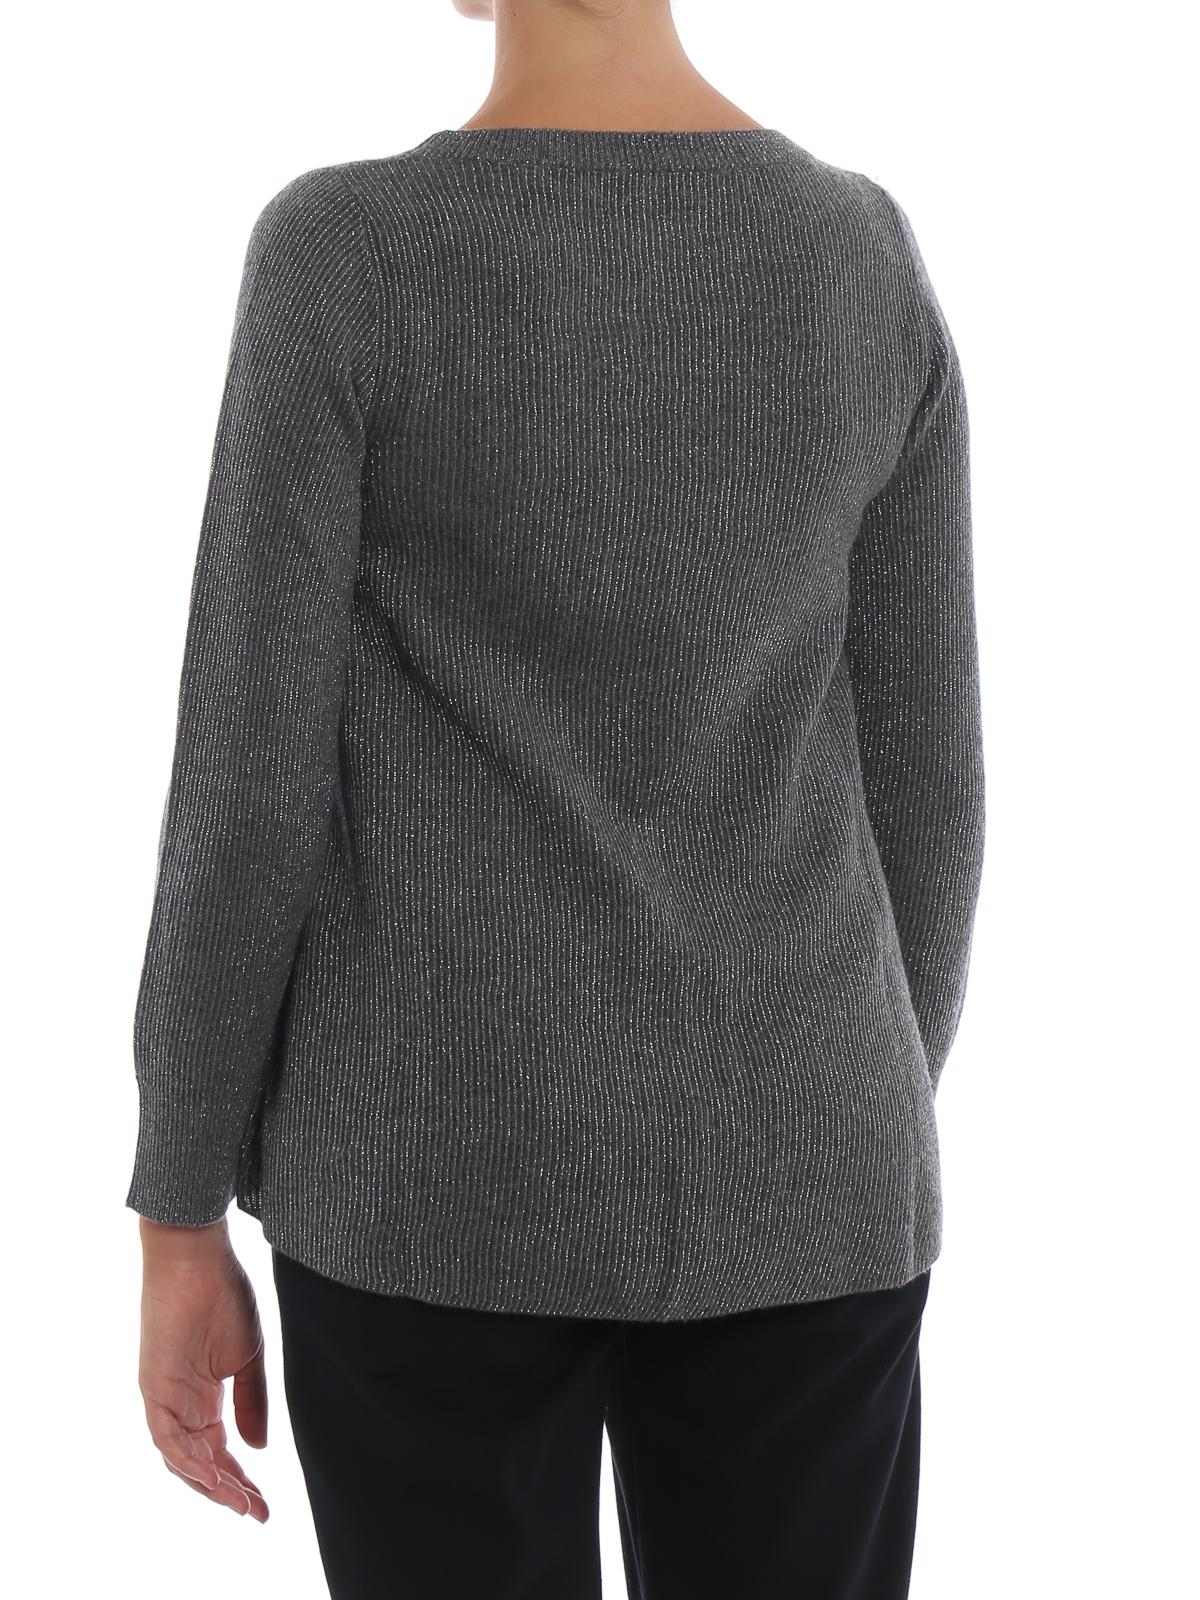 Grey crew neck sweater with lurex detail PAOLO FIORILLO CAPRI | 7 | 65171330